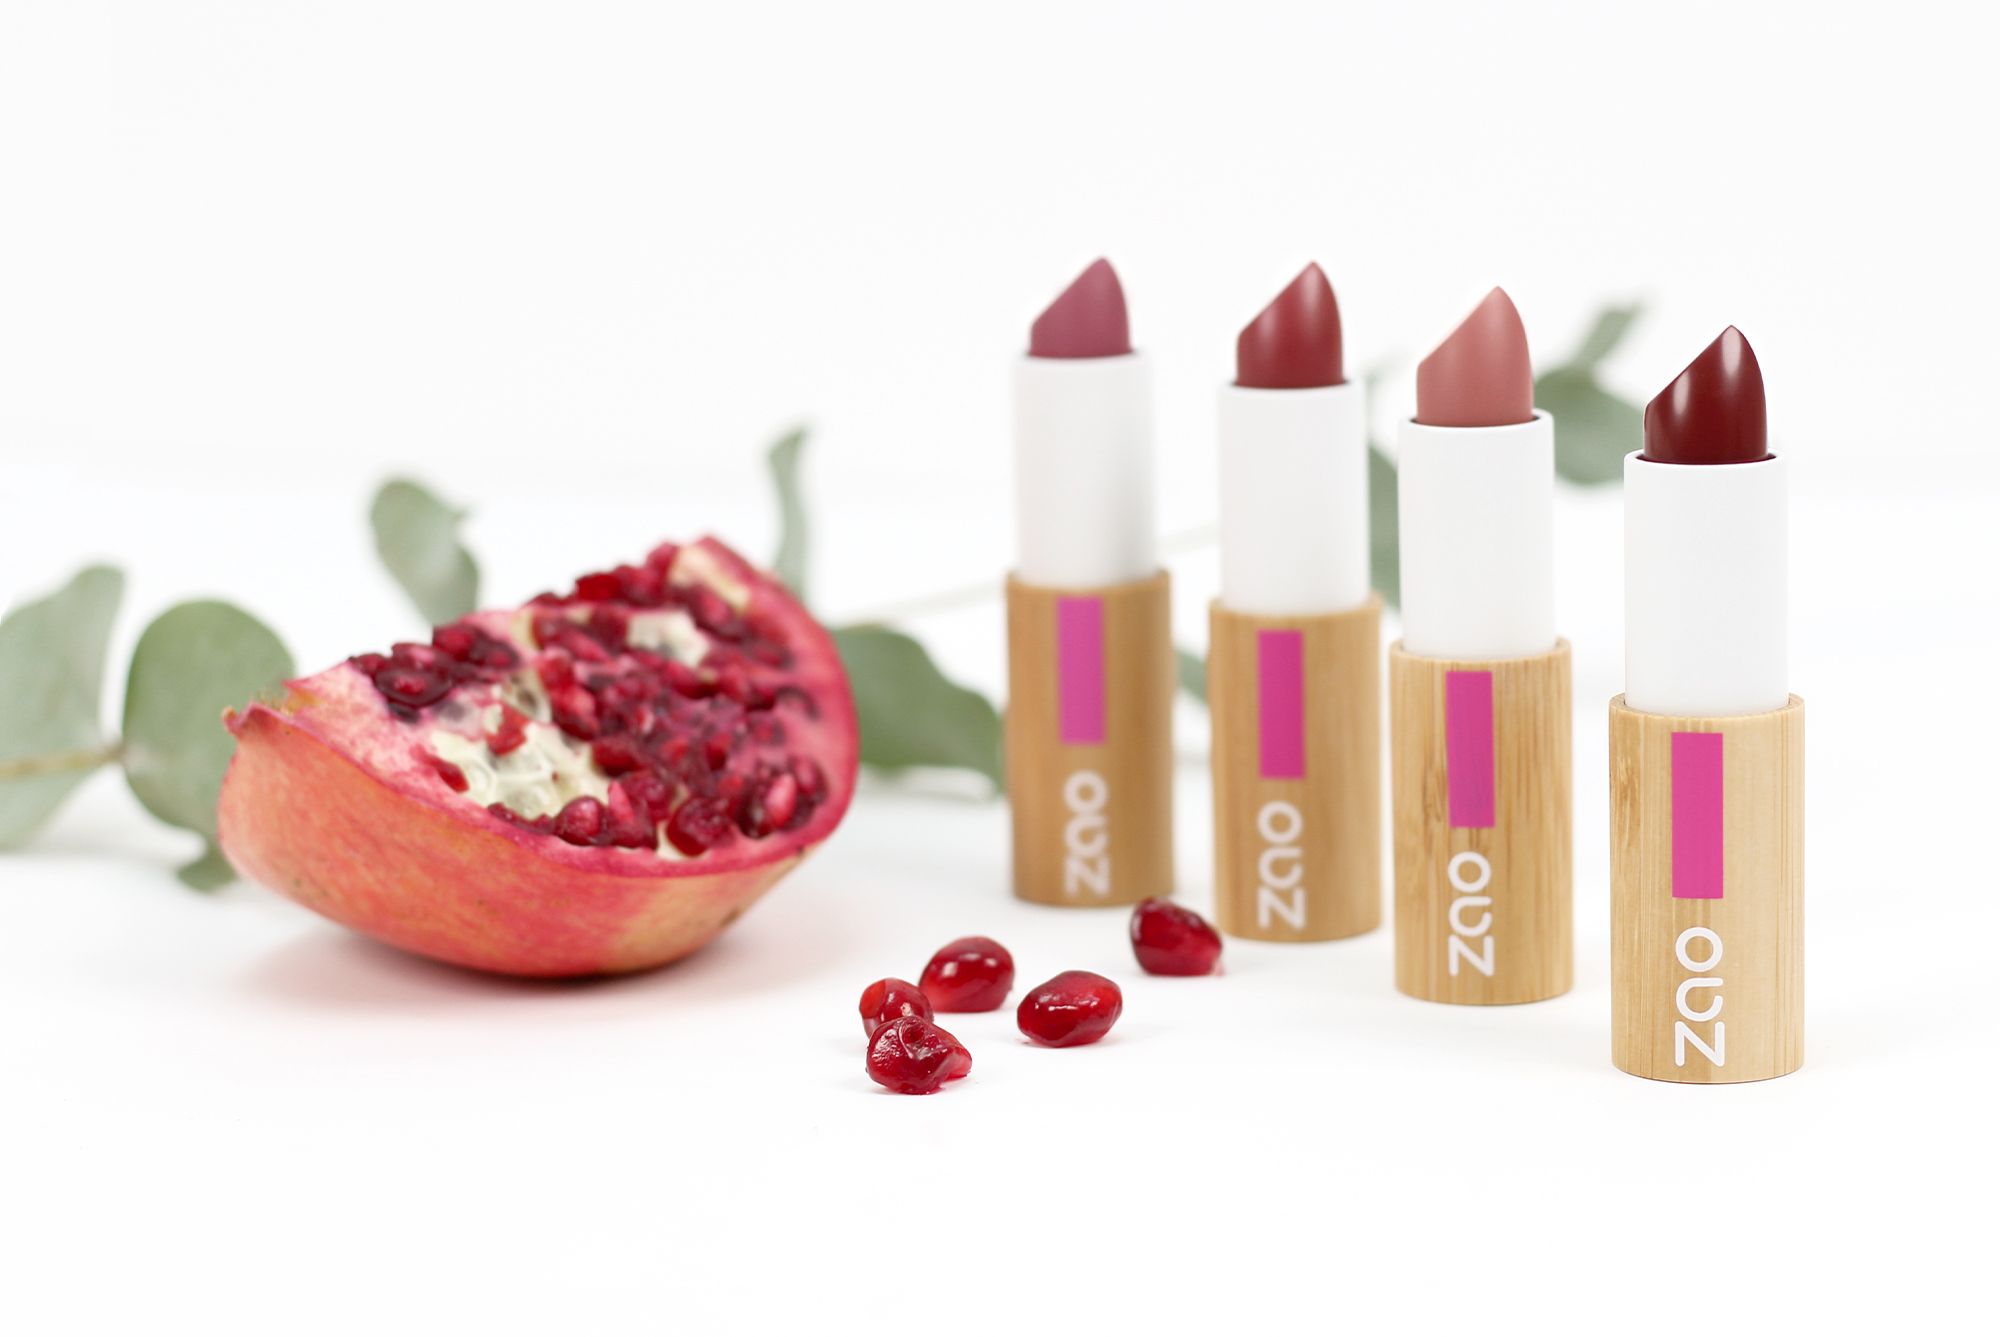 Cocoon lipstick